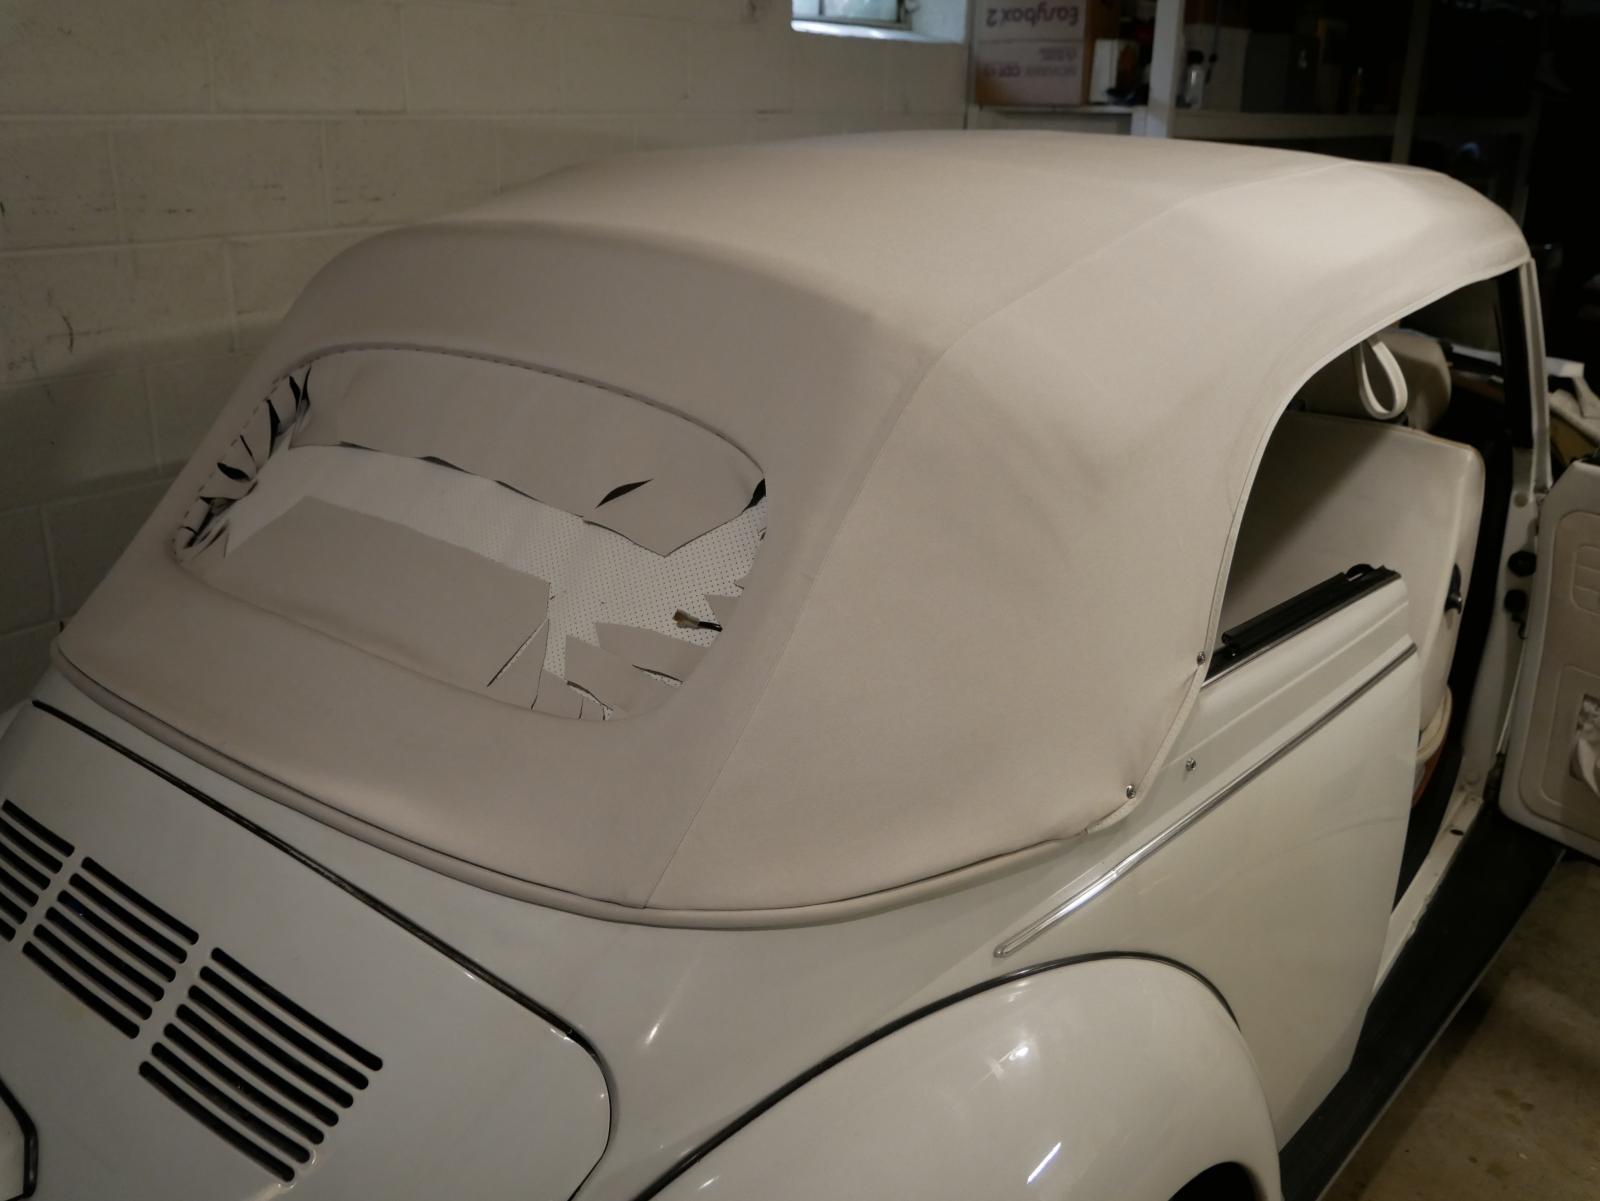 '79 Super Beetle convertible top sans wrinkle